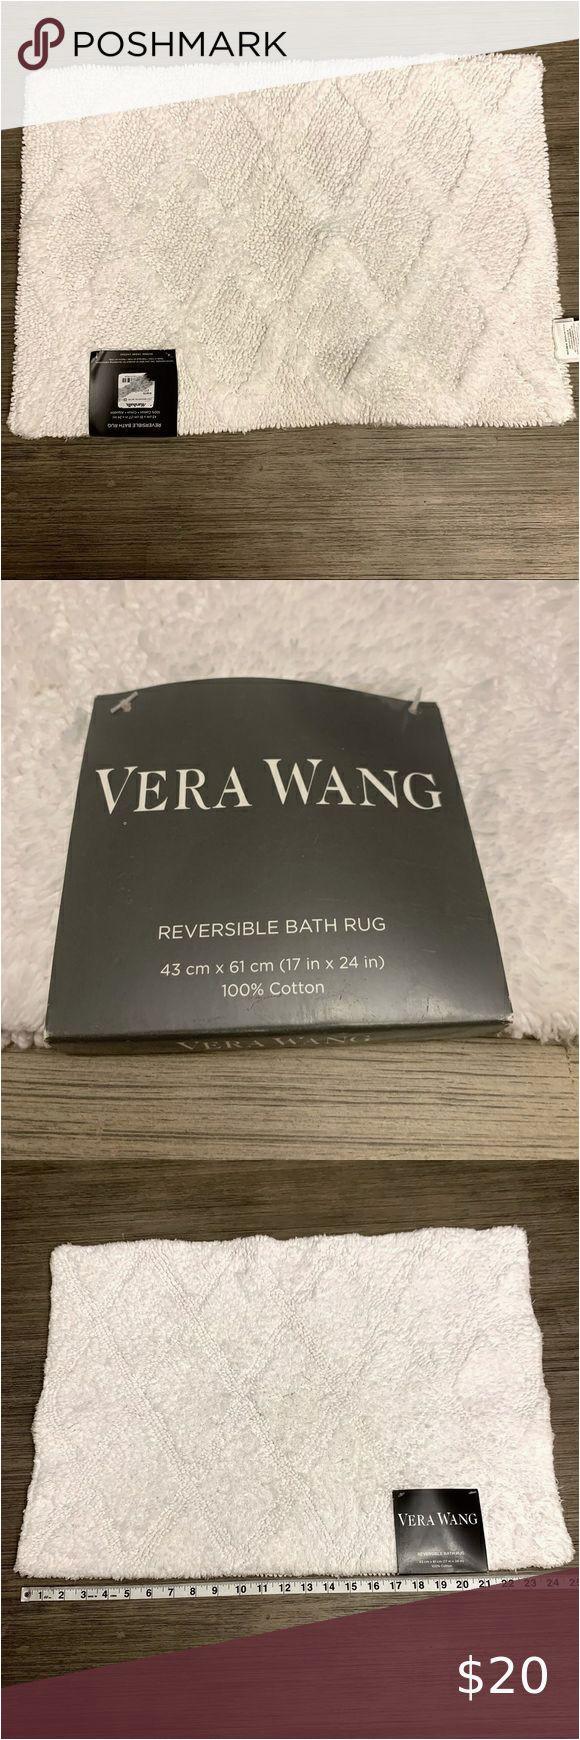 Vera Wang Bath Rug Diamond Pin On My Posh Picks